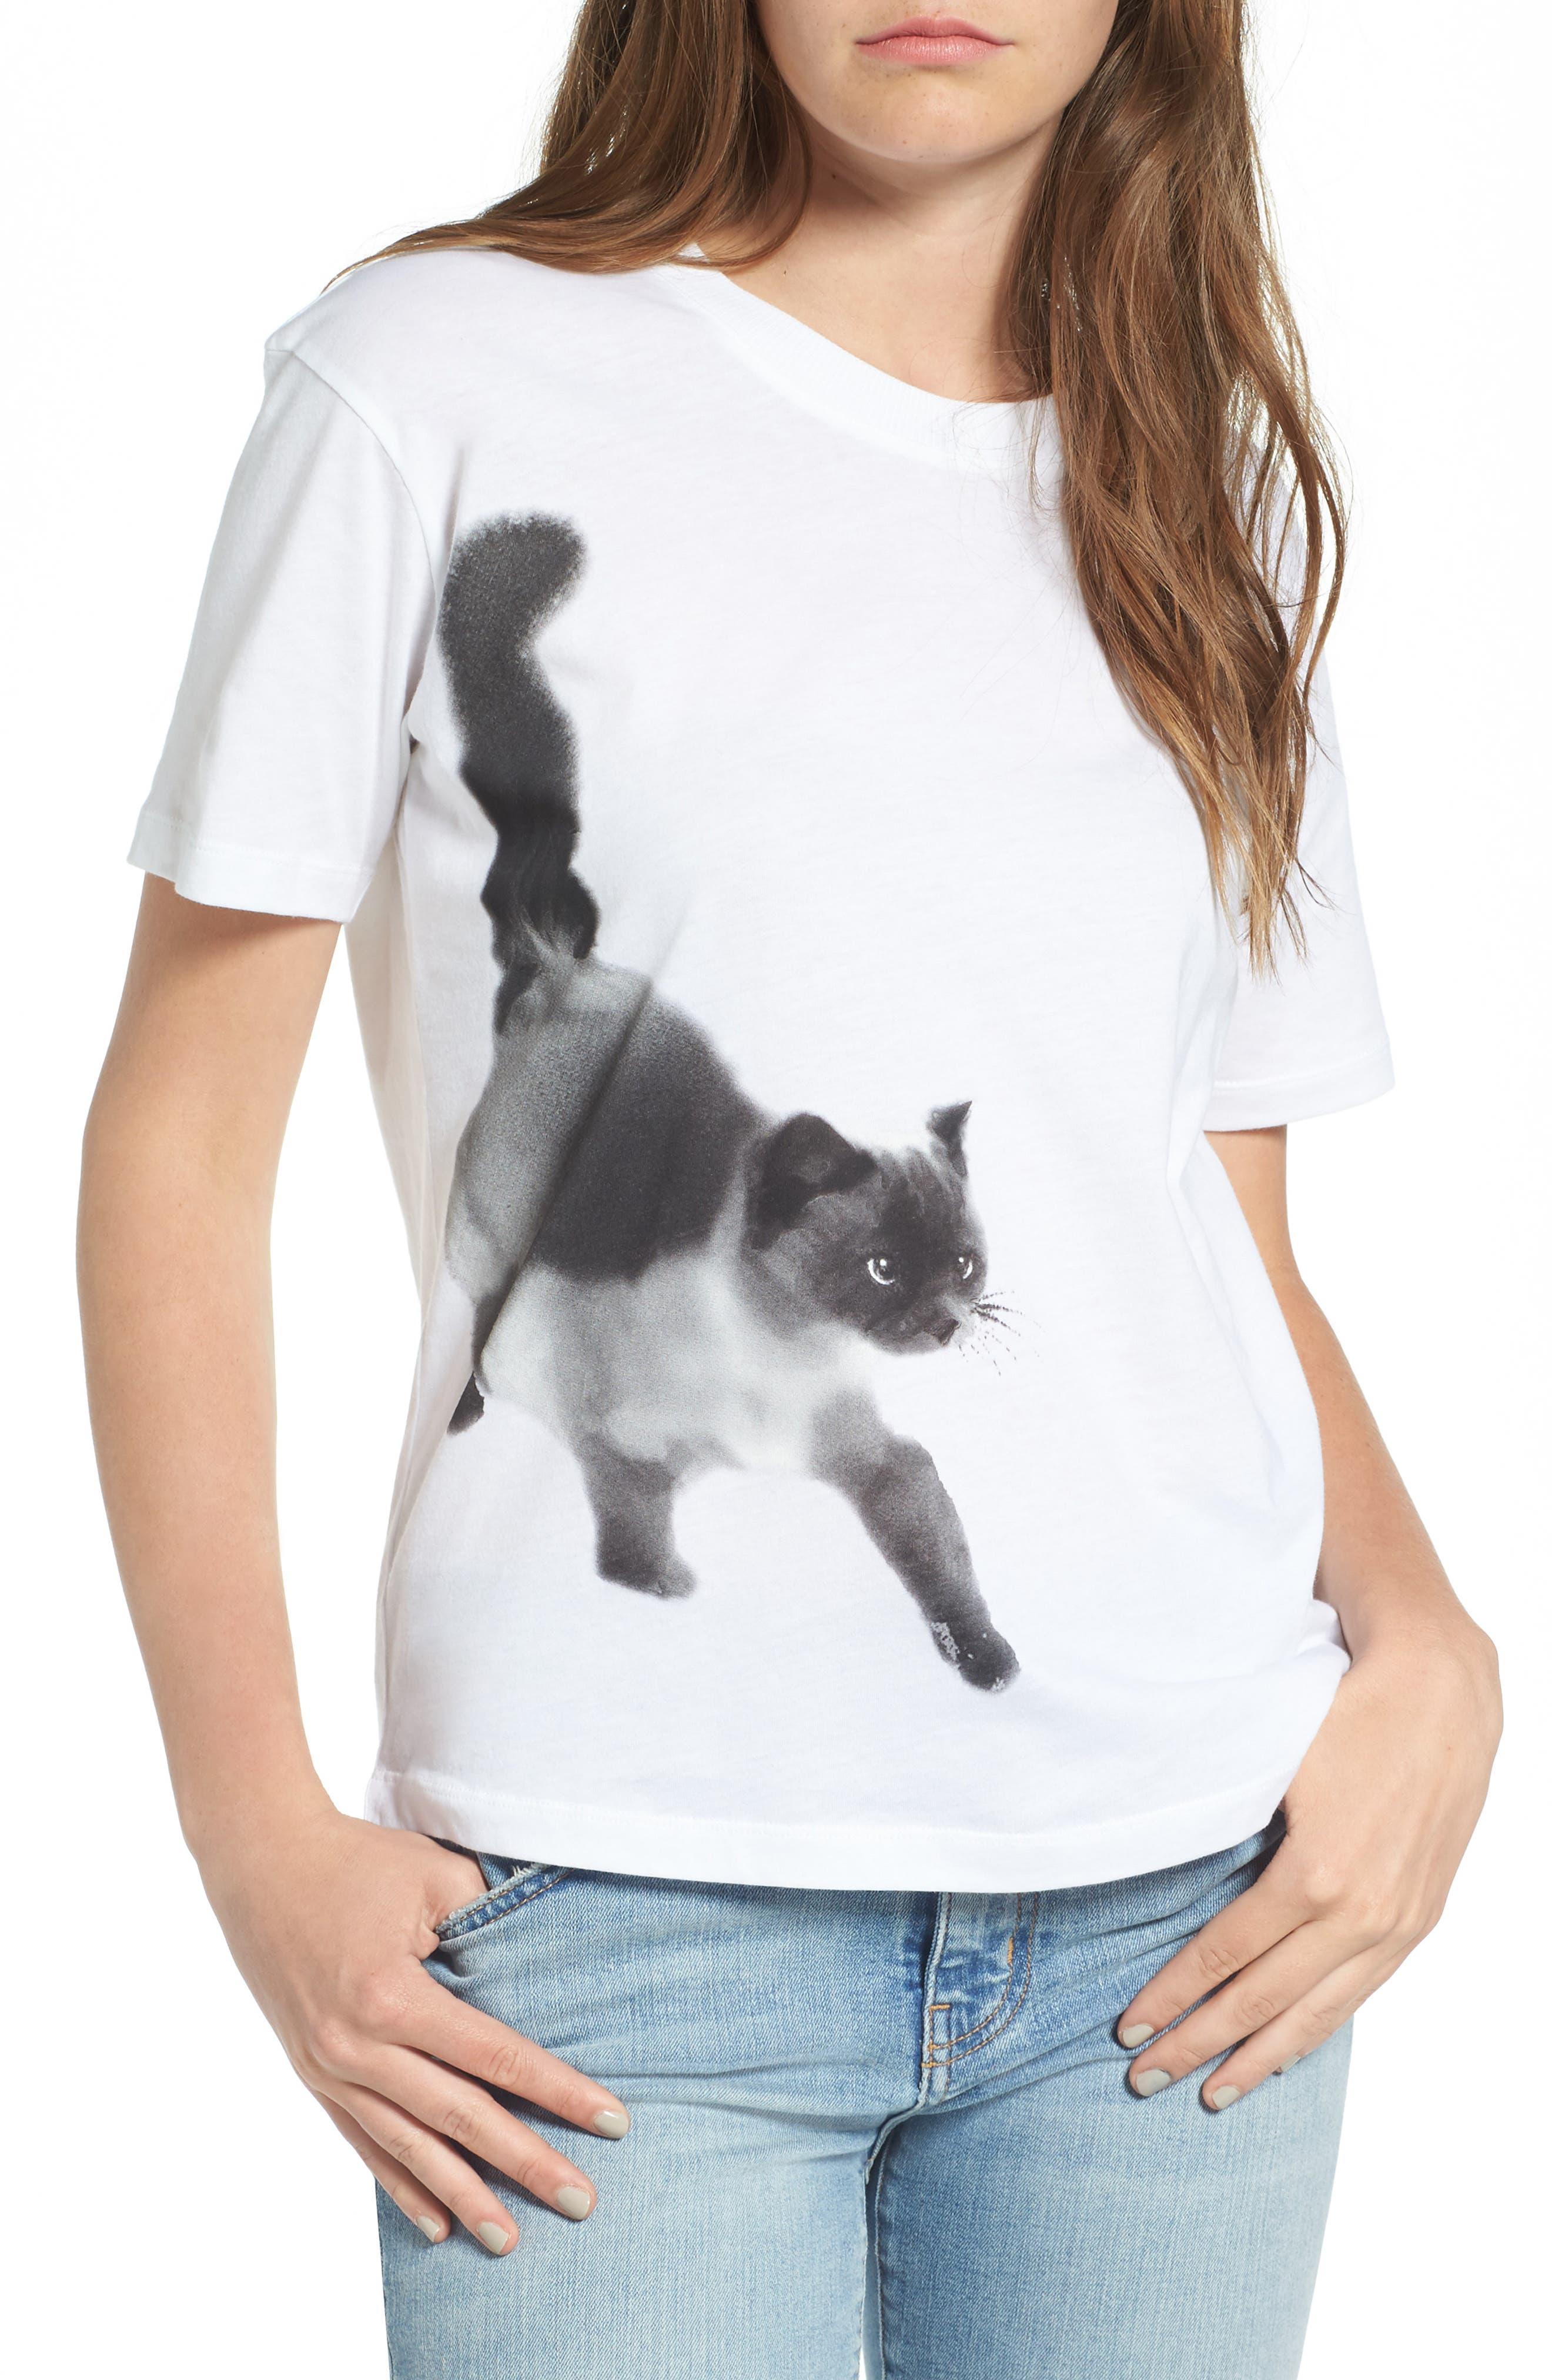 Paul & Joe Sister Cat Print Graphic Tee